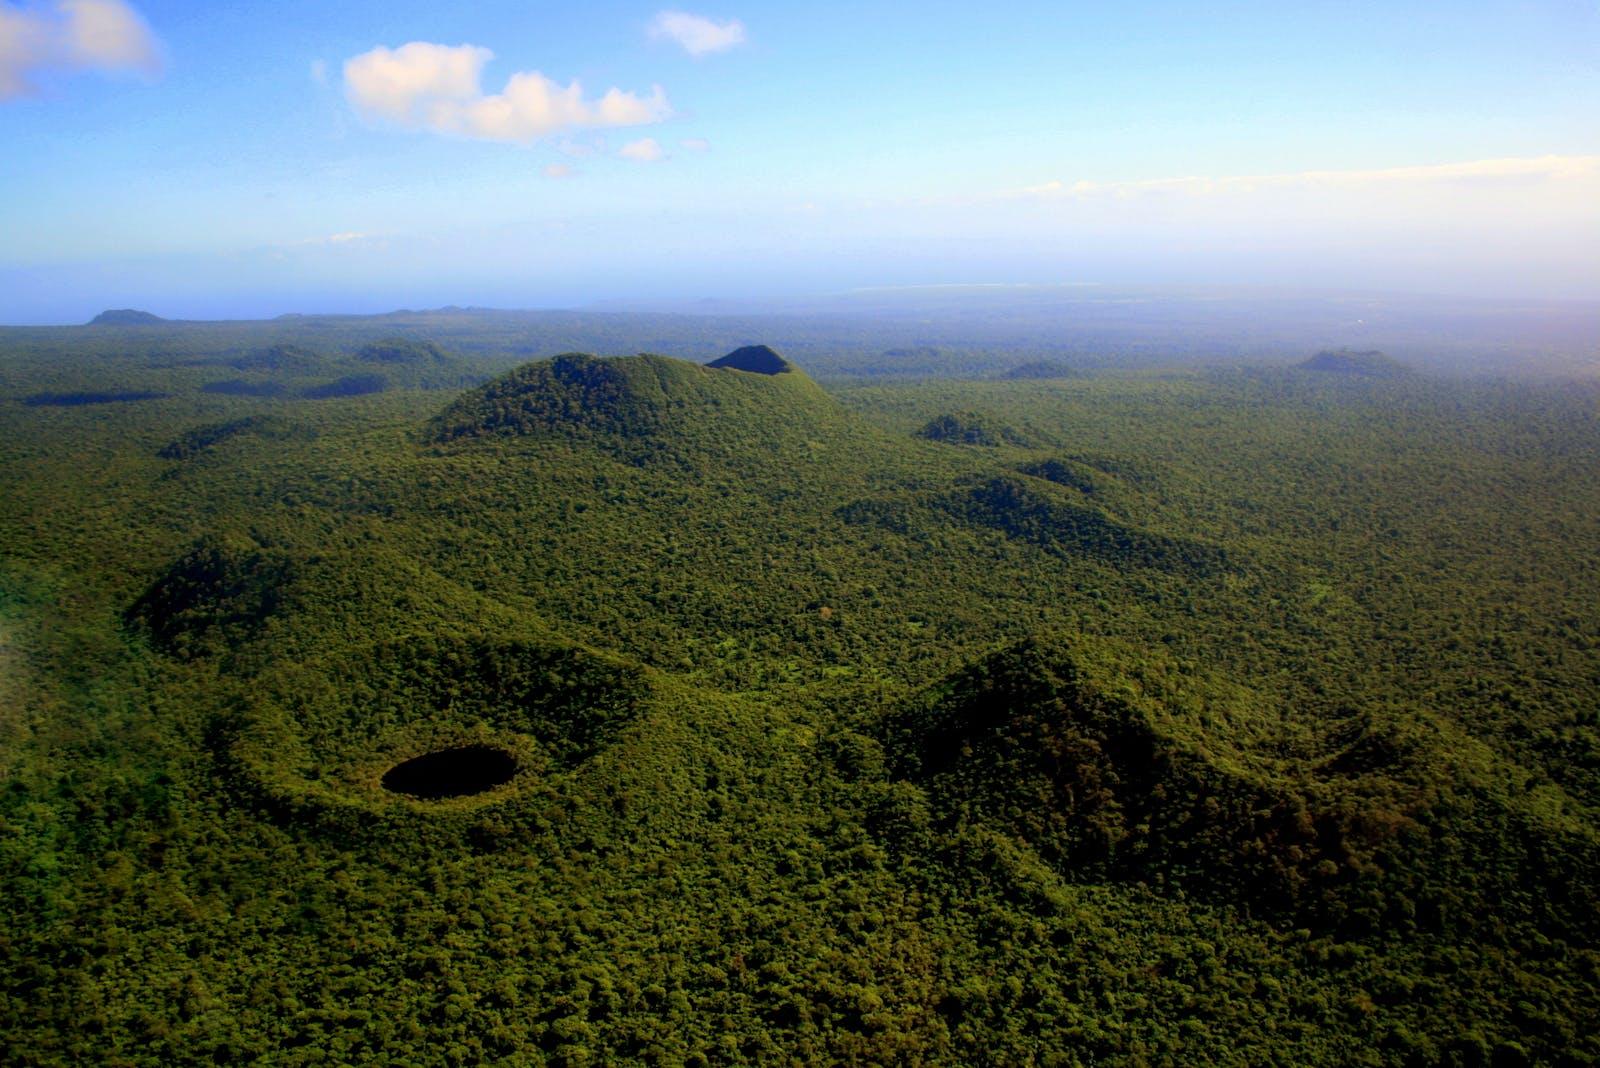 Samoan Tropical Moist Forests